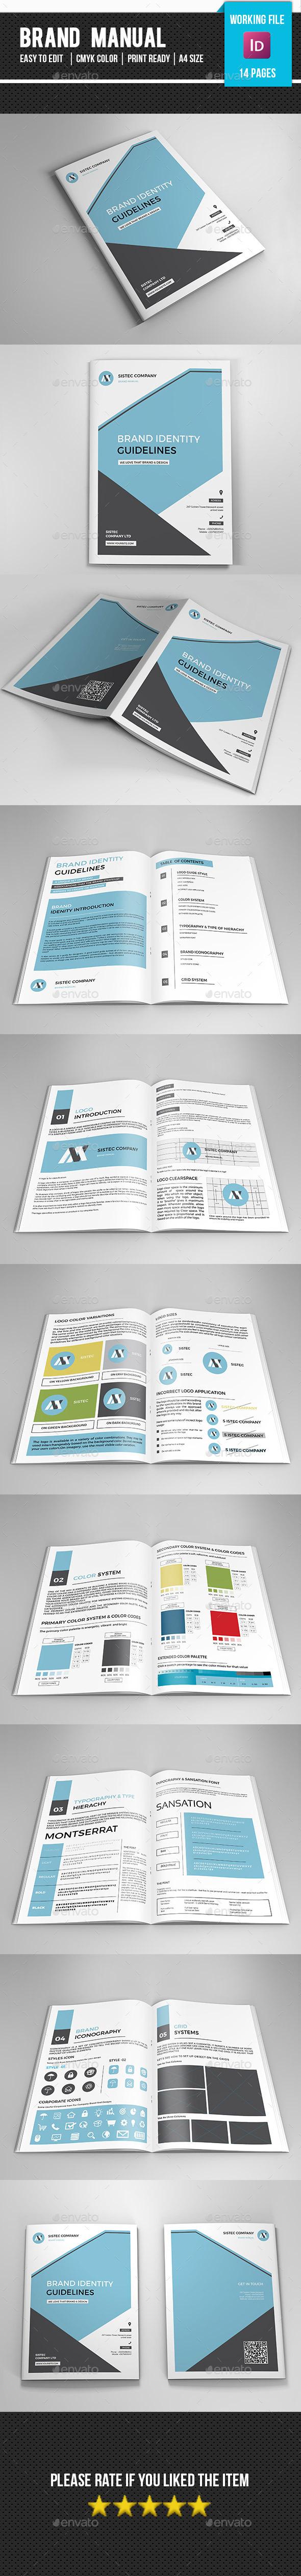 Brand Manual-V03 - Corporate Brochures